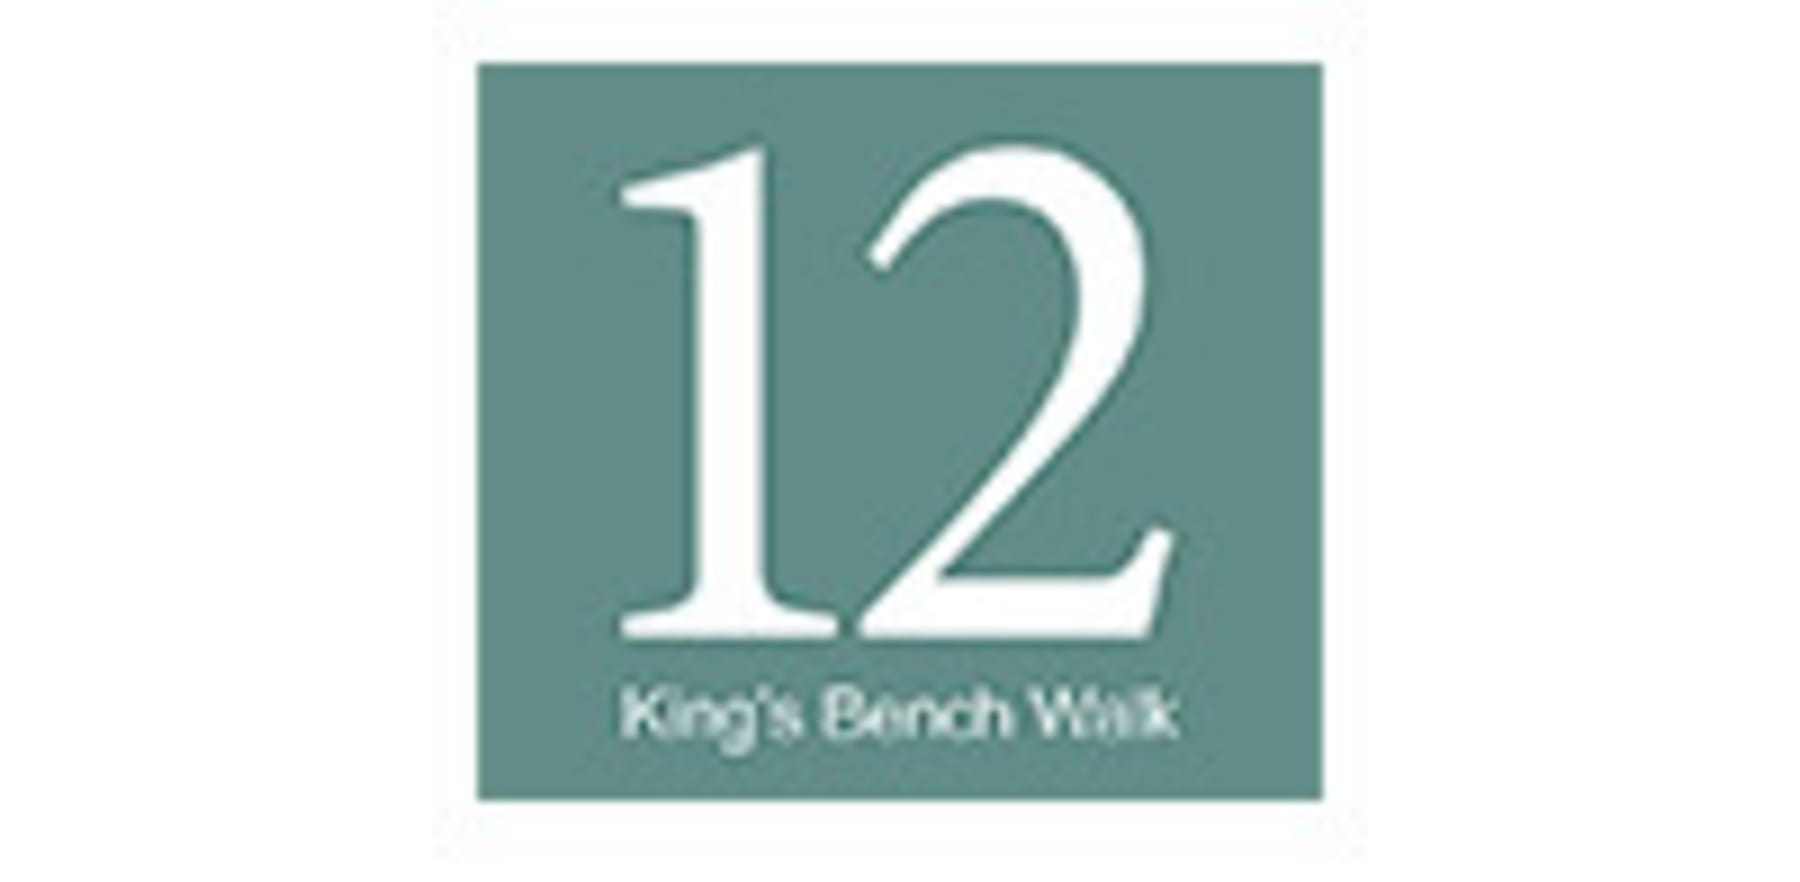 12 King's Bench Walk